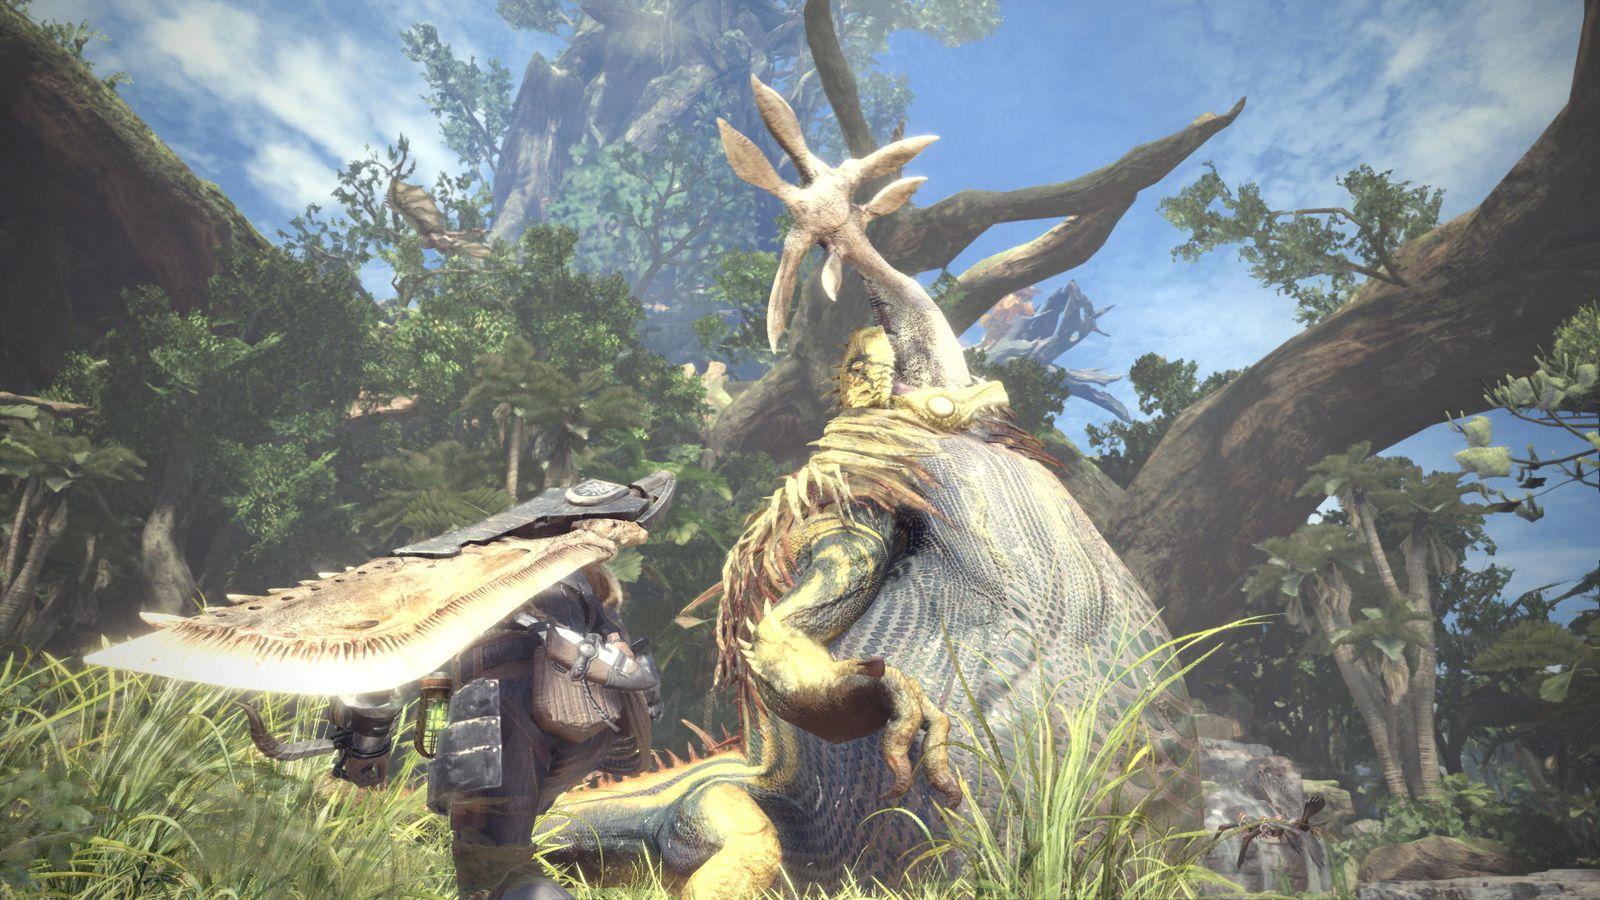 Monster Hunter: World will get free DLC